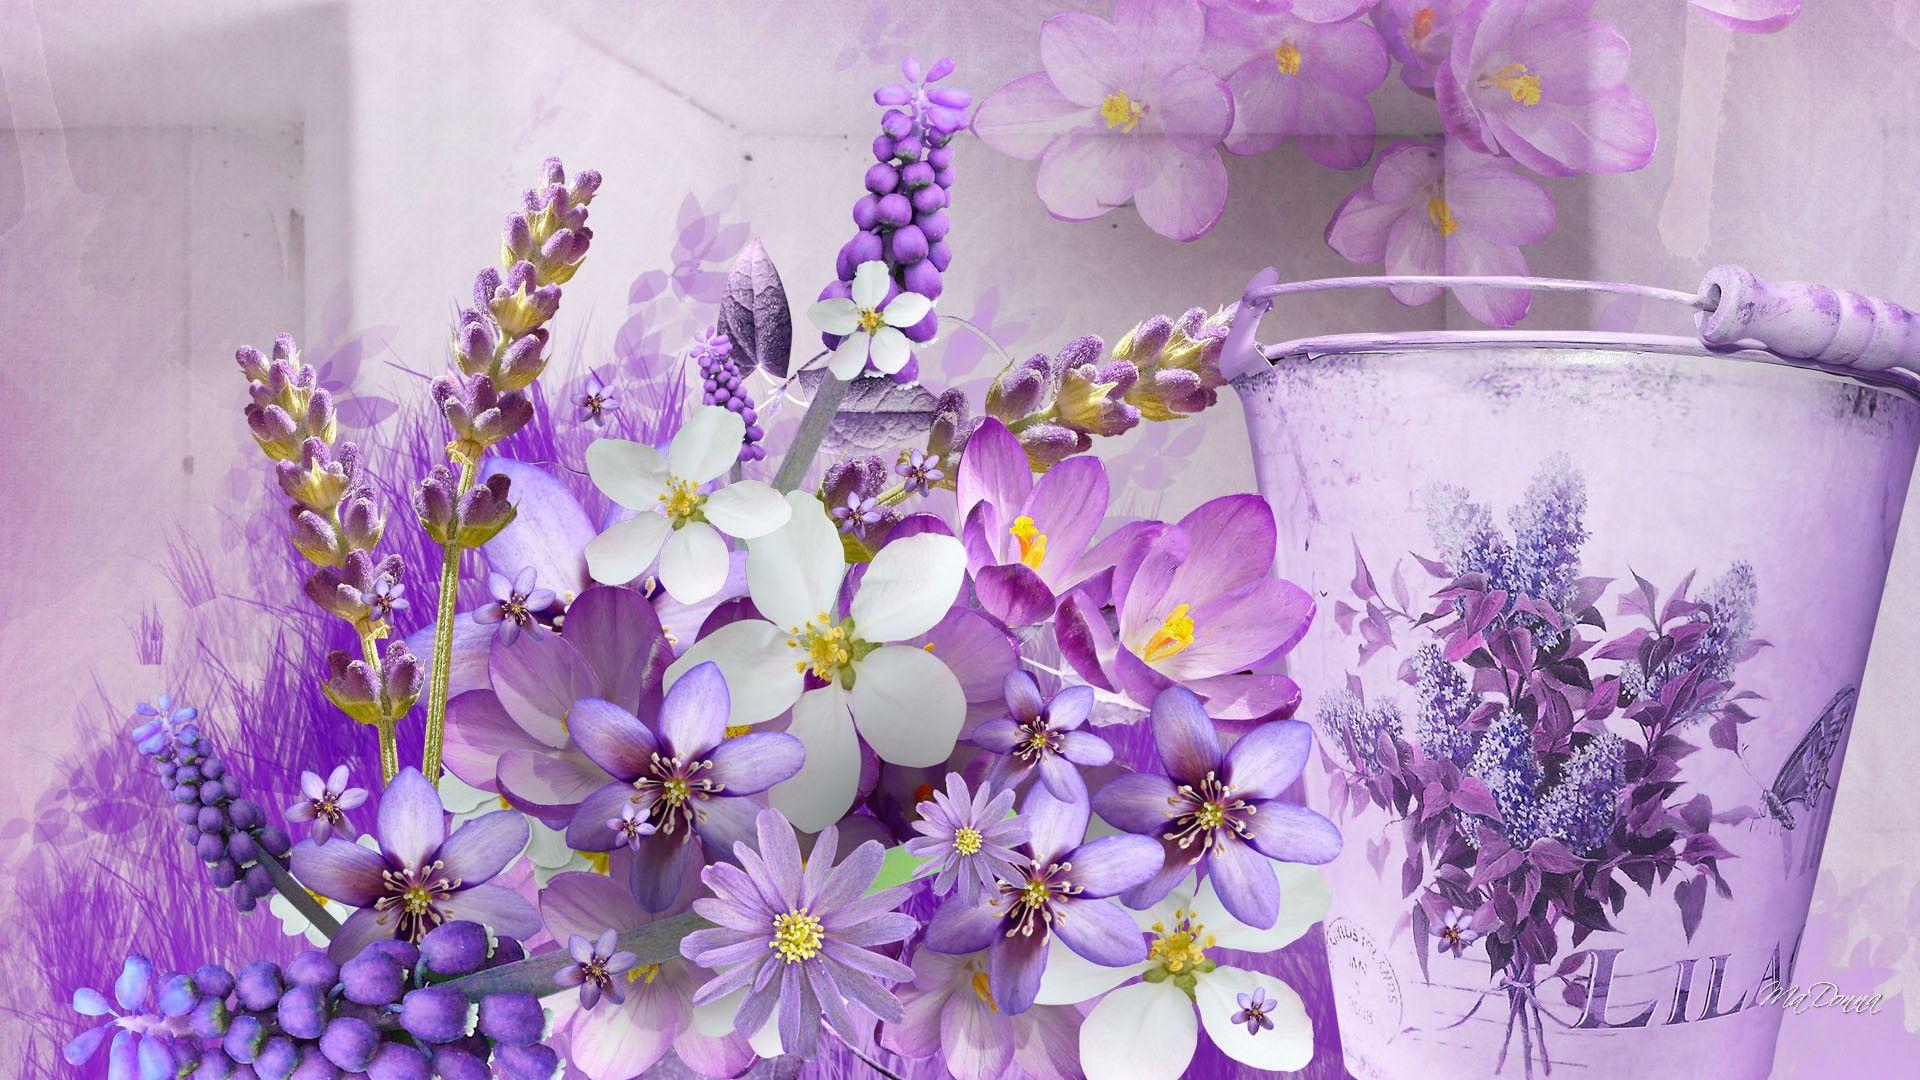 lavenderlovelylavenderhdwallpaper Лавандовые страсти